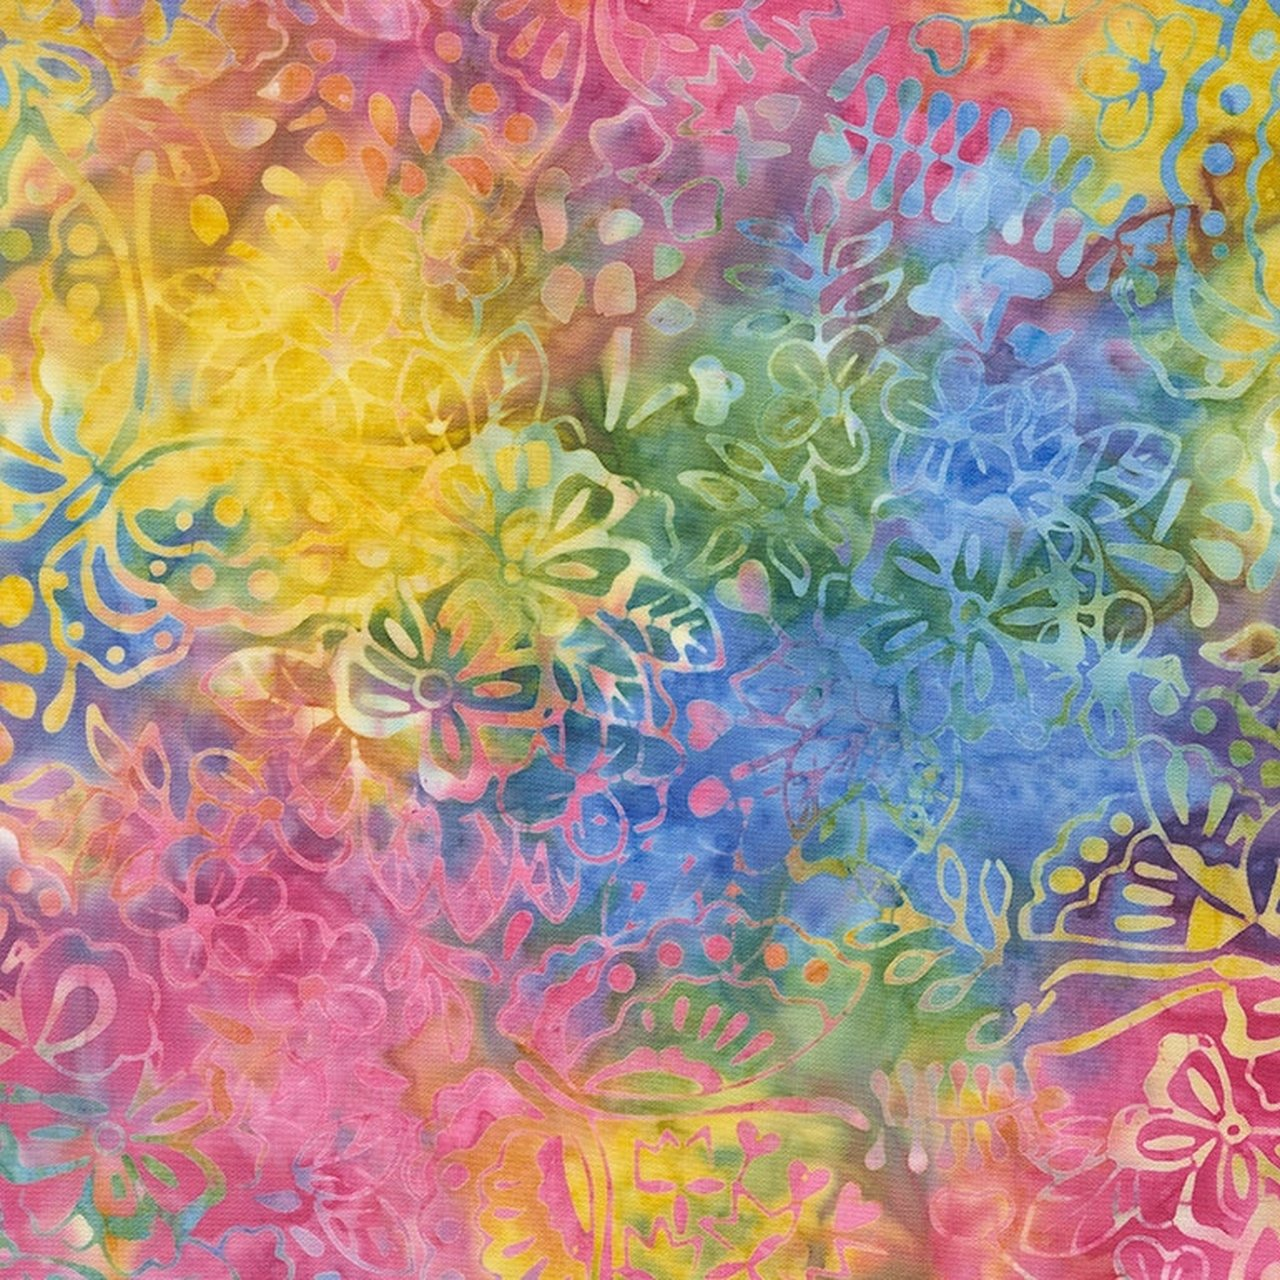 106 Awaken Extra Wide Tonga Batik Quilt Backing - Dazzle